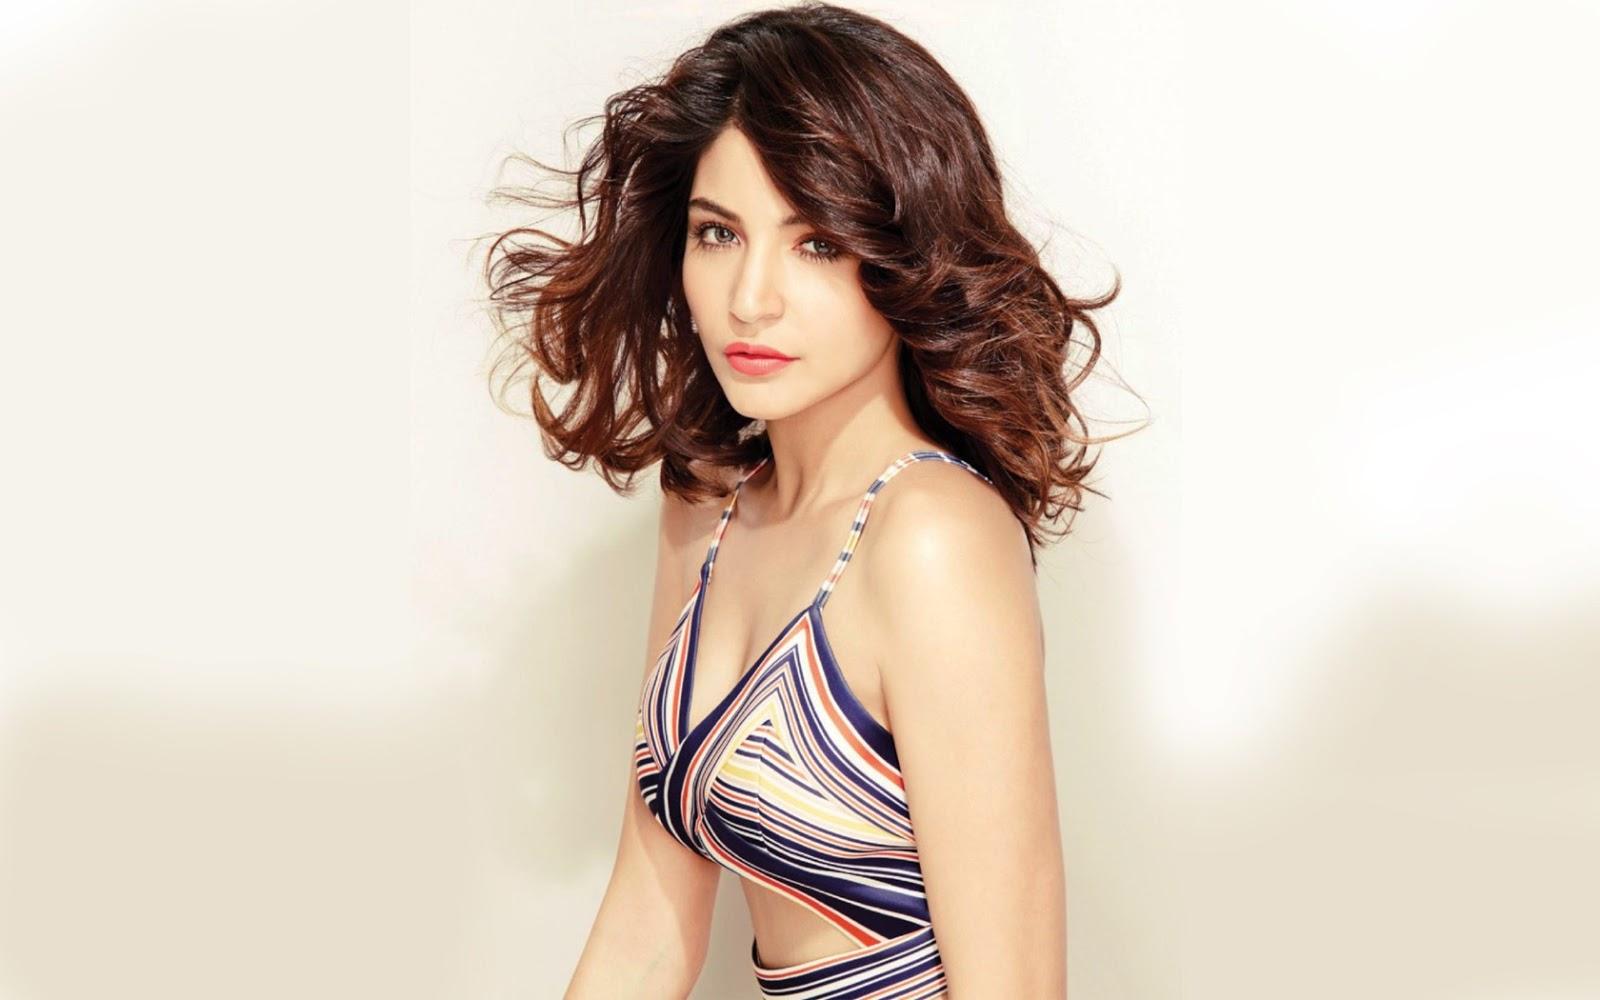 Priyanka Chopra Hot Bikini, Bra, Swimsuit, Navel, Cleavage Anushka sharma hot photoshoot pics